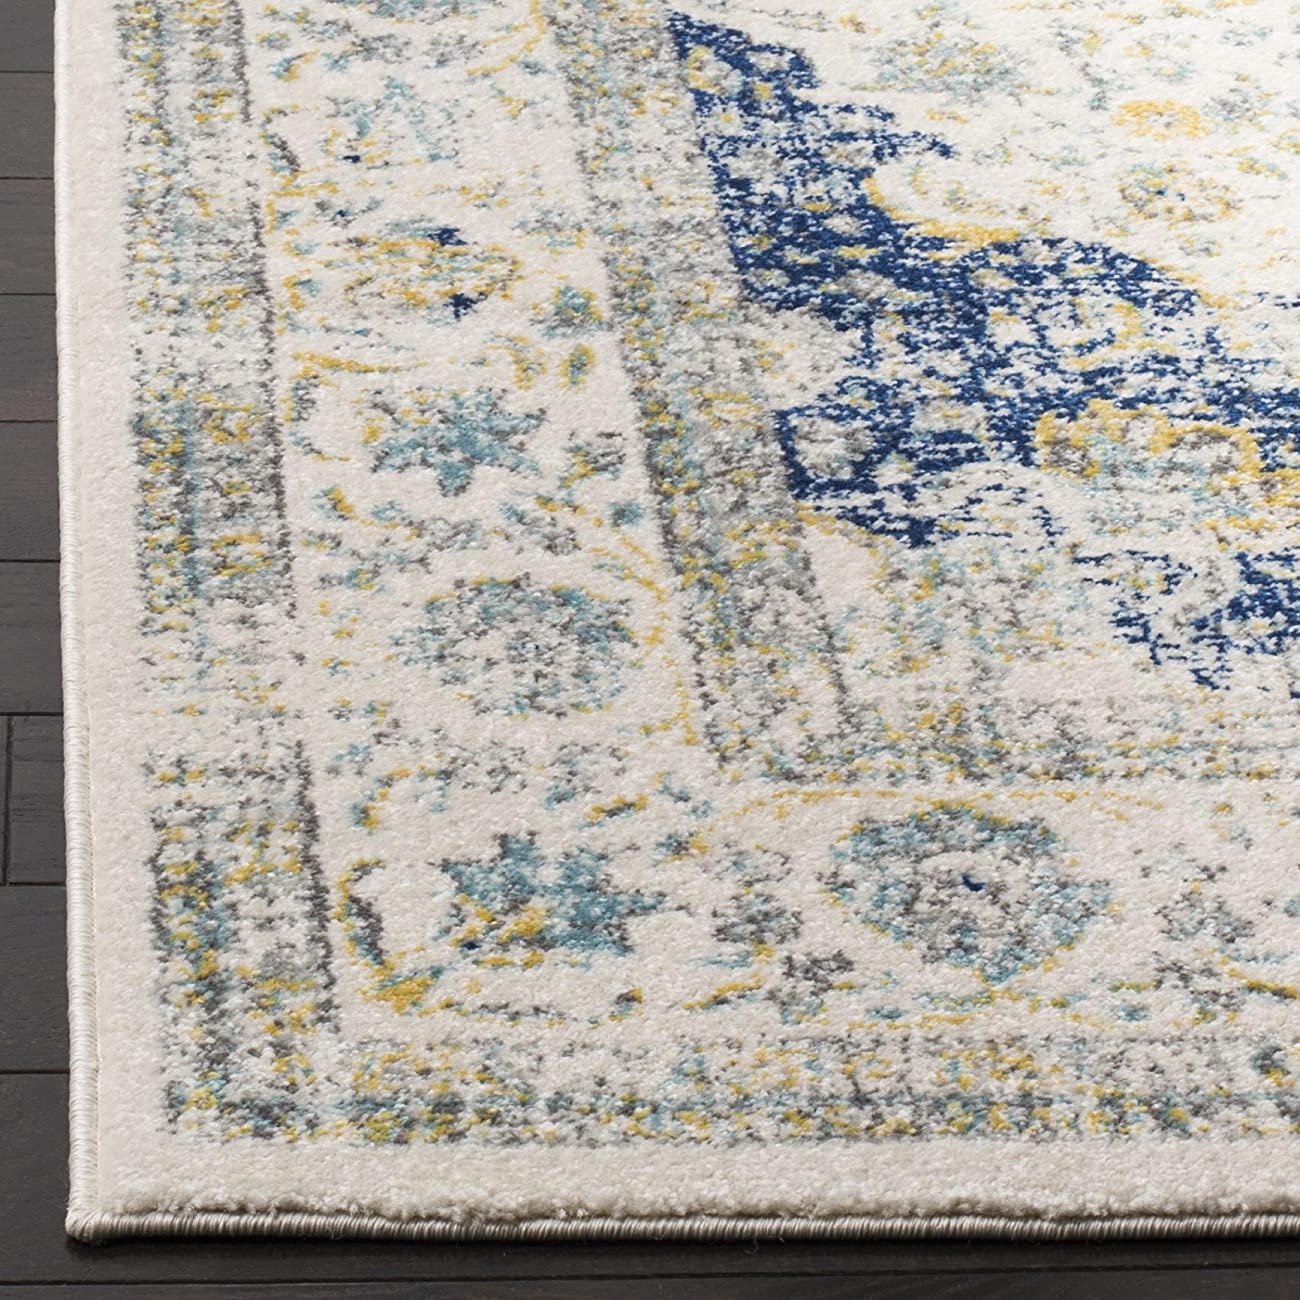 Safavieh Evoke Collection EVK220C Oriental Vintage Ivory and Blue Area Rug (9' x 12') 1